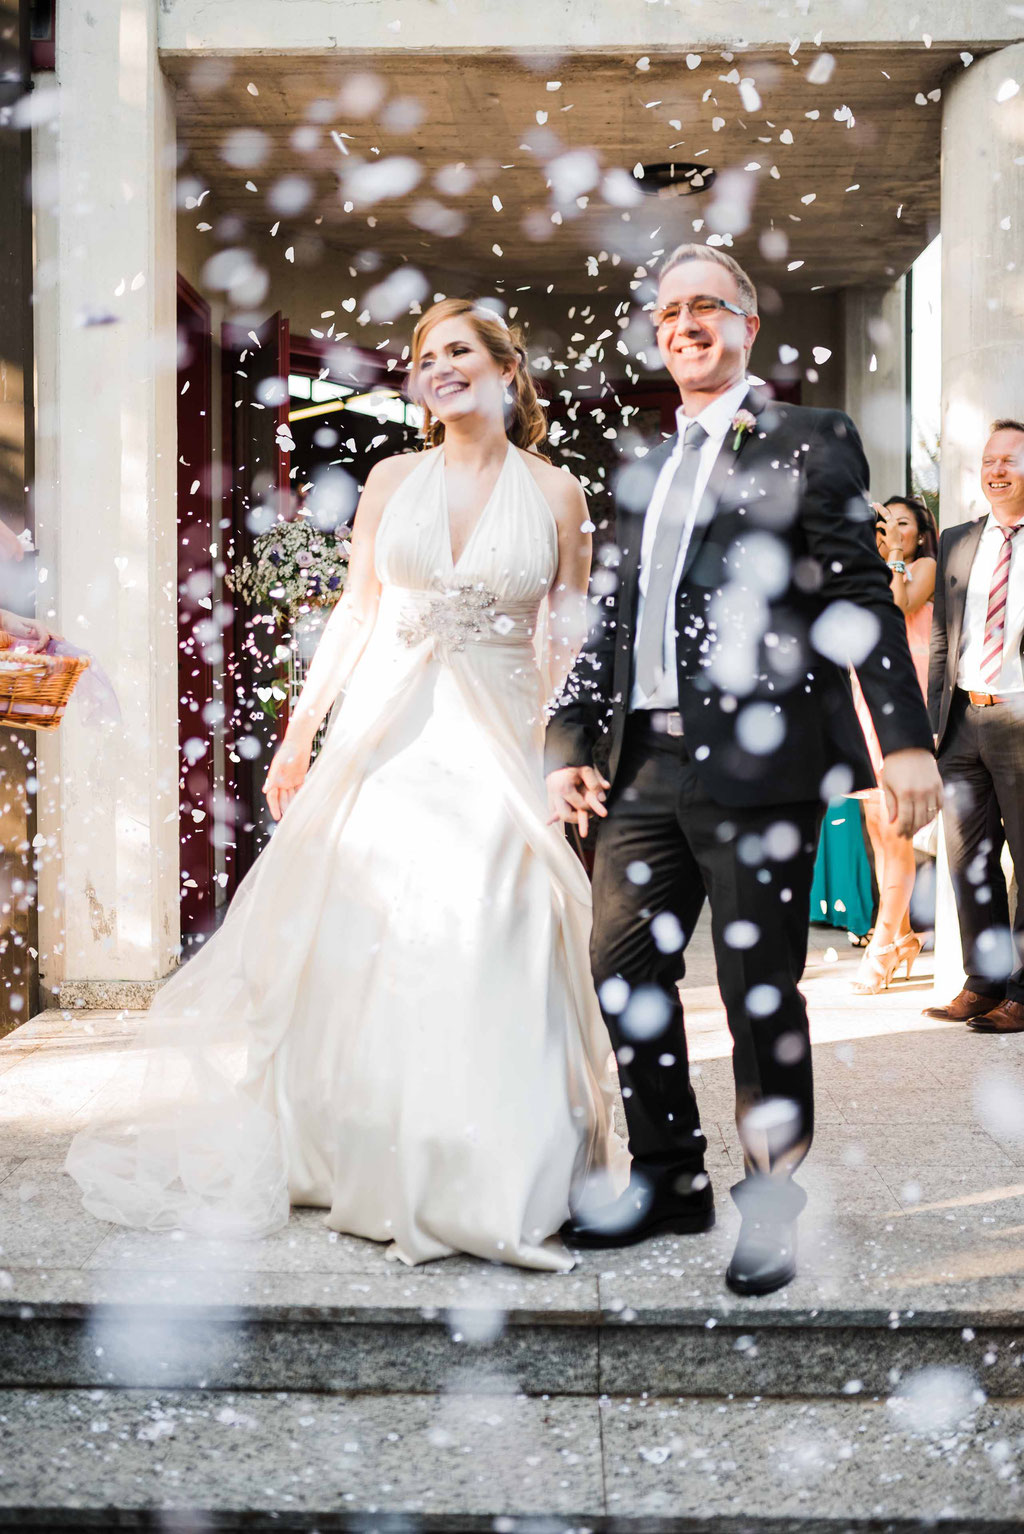 Hochzeitsfotograf Esslingen - Auszug